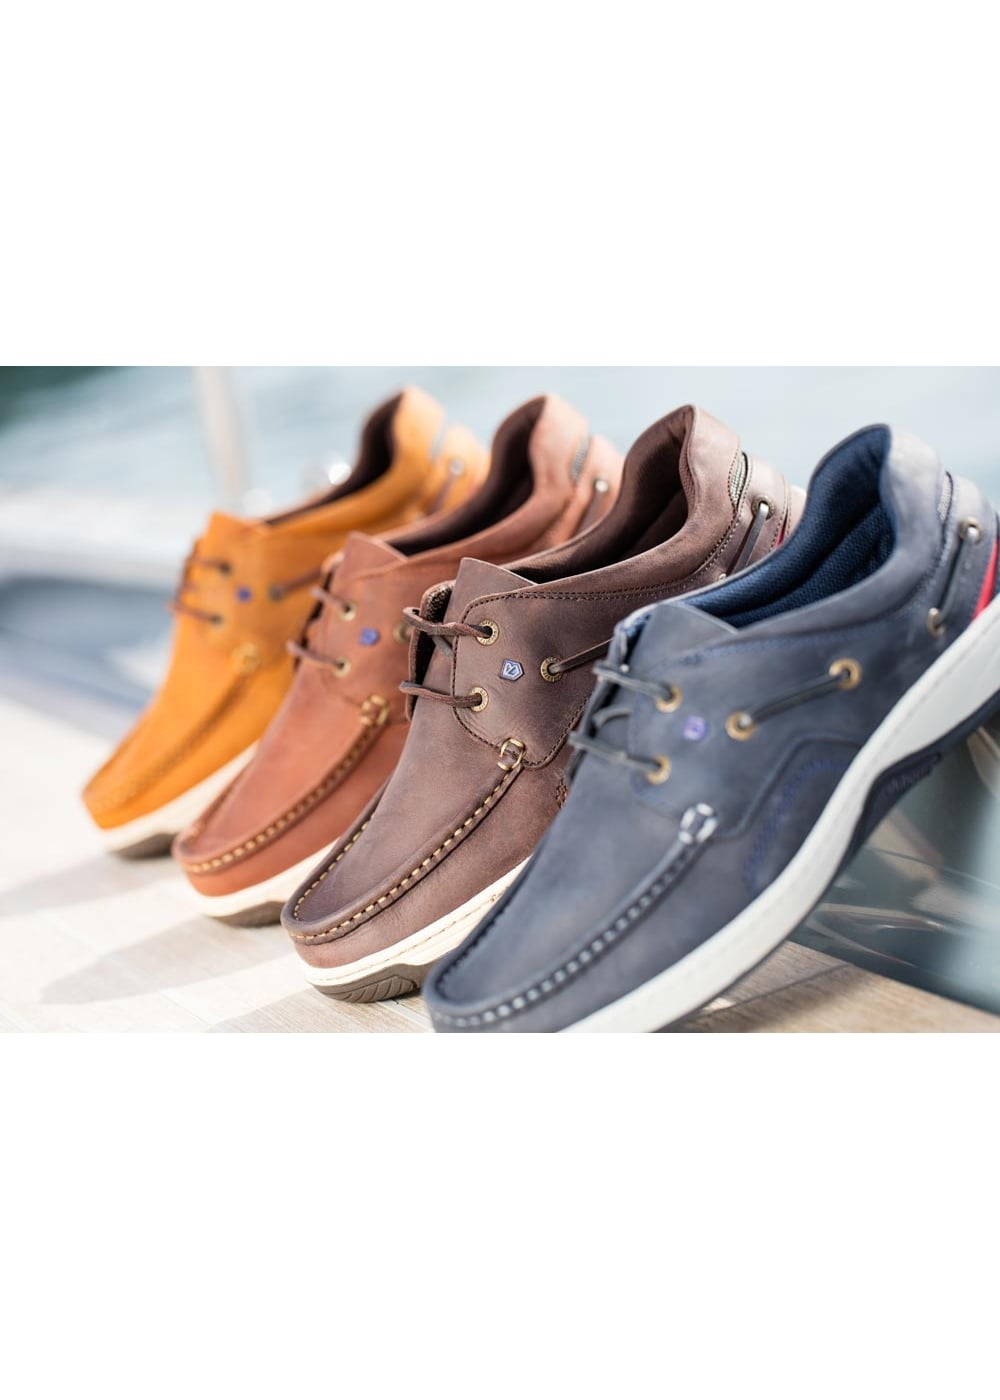 ef8e14b02b Dubarry Navigator Deck Shoe - Mens from A Hume UK